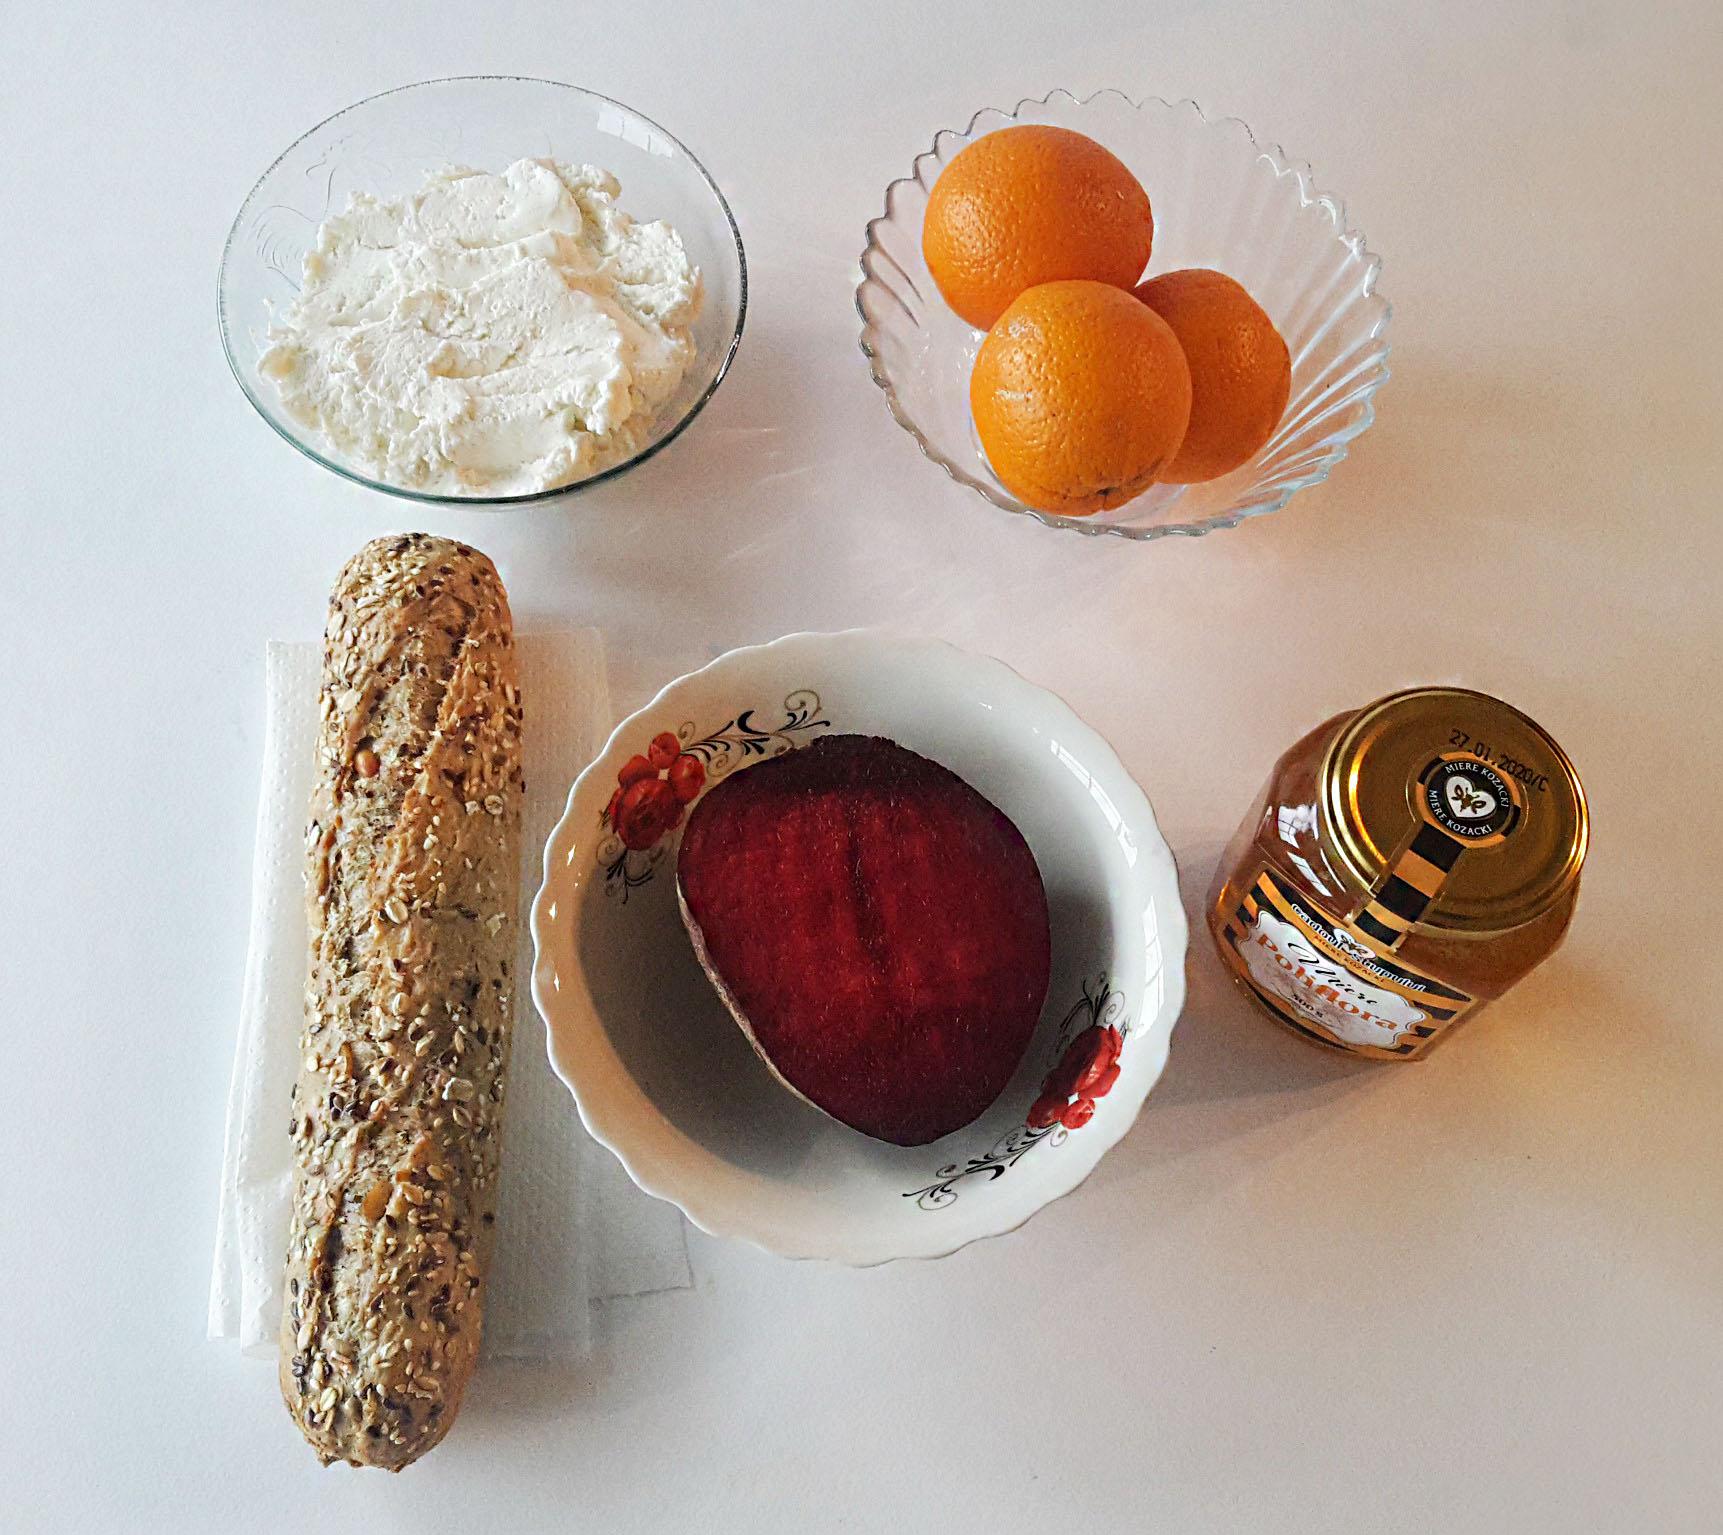 crostini cu sfecla rosie, branza de vaci si portocale 00